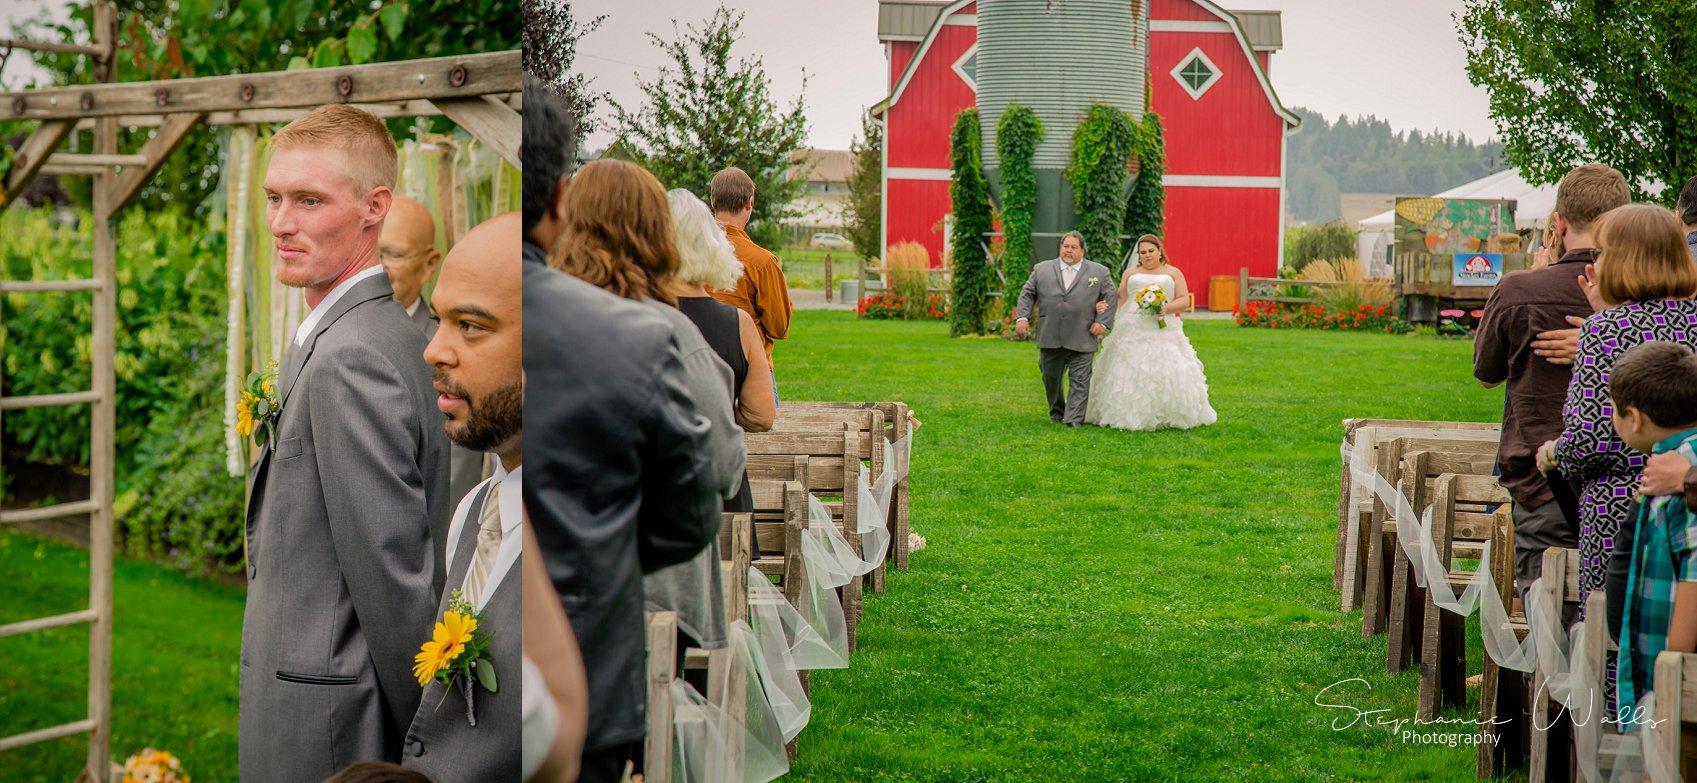 Kimble Wedding 095 Marlena & Allans | Snohomish Red Barn Events (Stocker Farms) | Snohomish, Wa Wedding Photographer